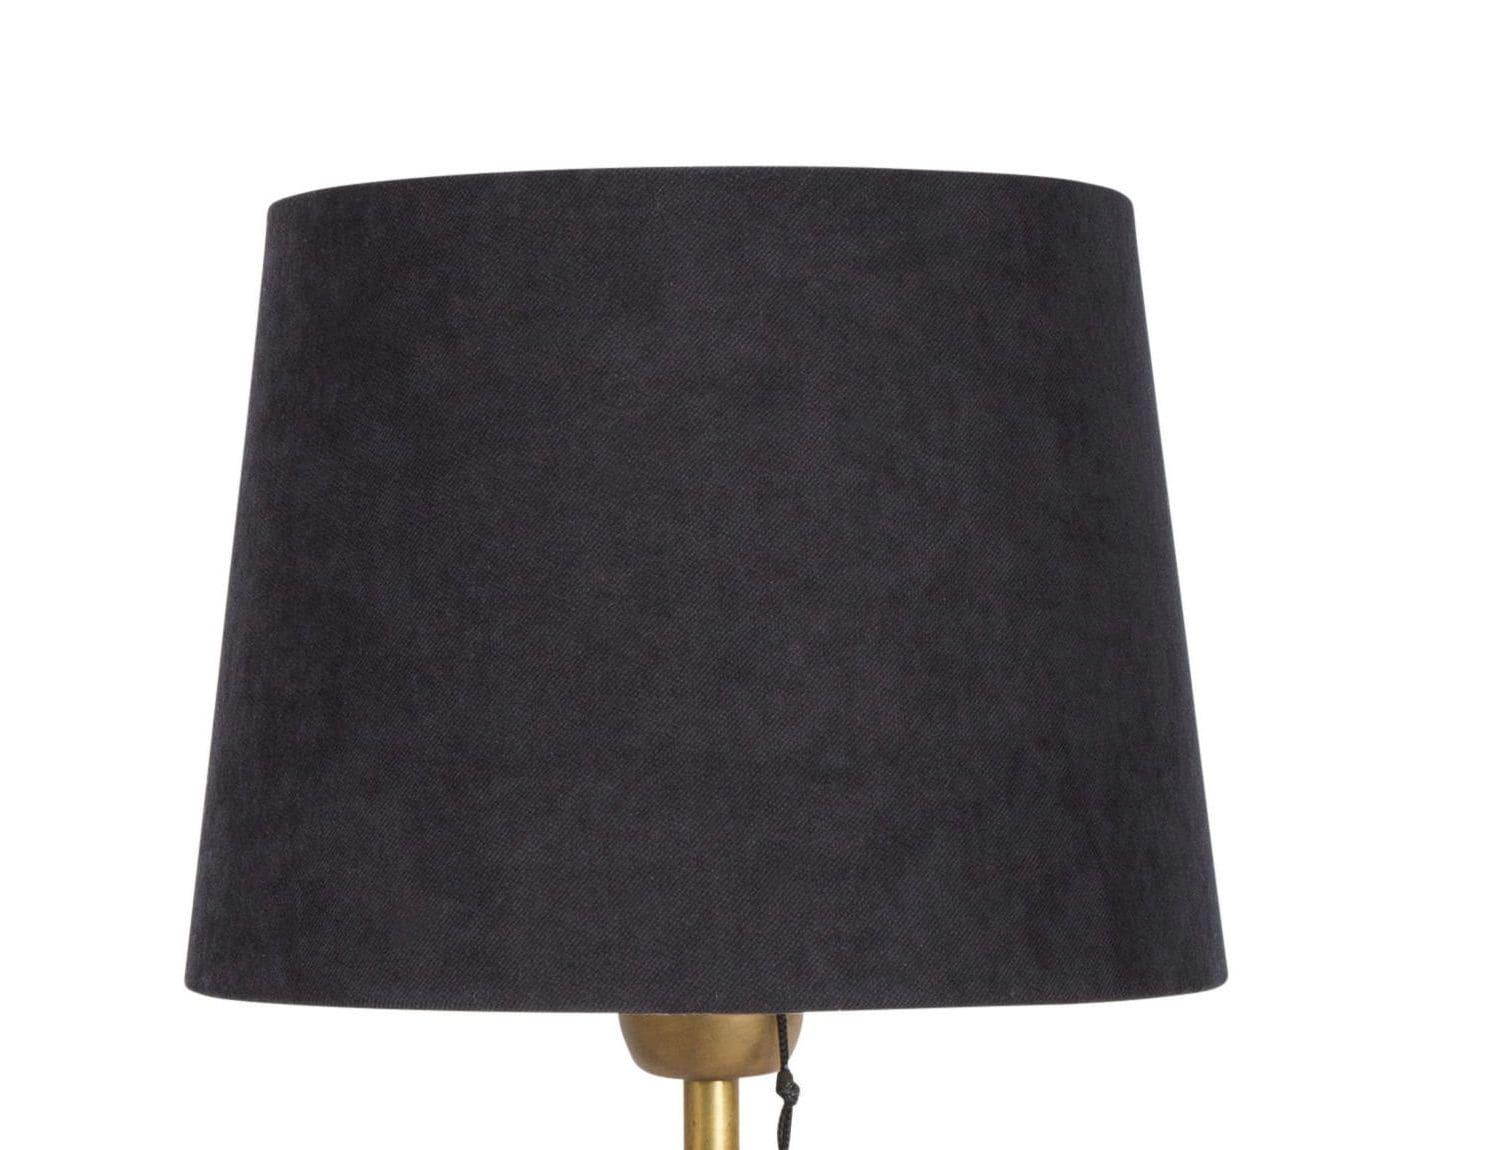 Viken 23 lampskärm svart sammet